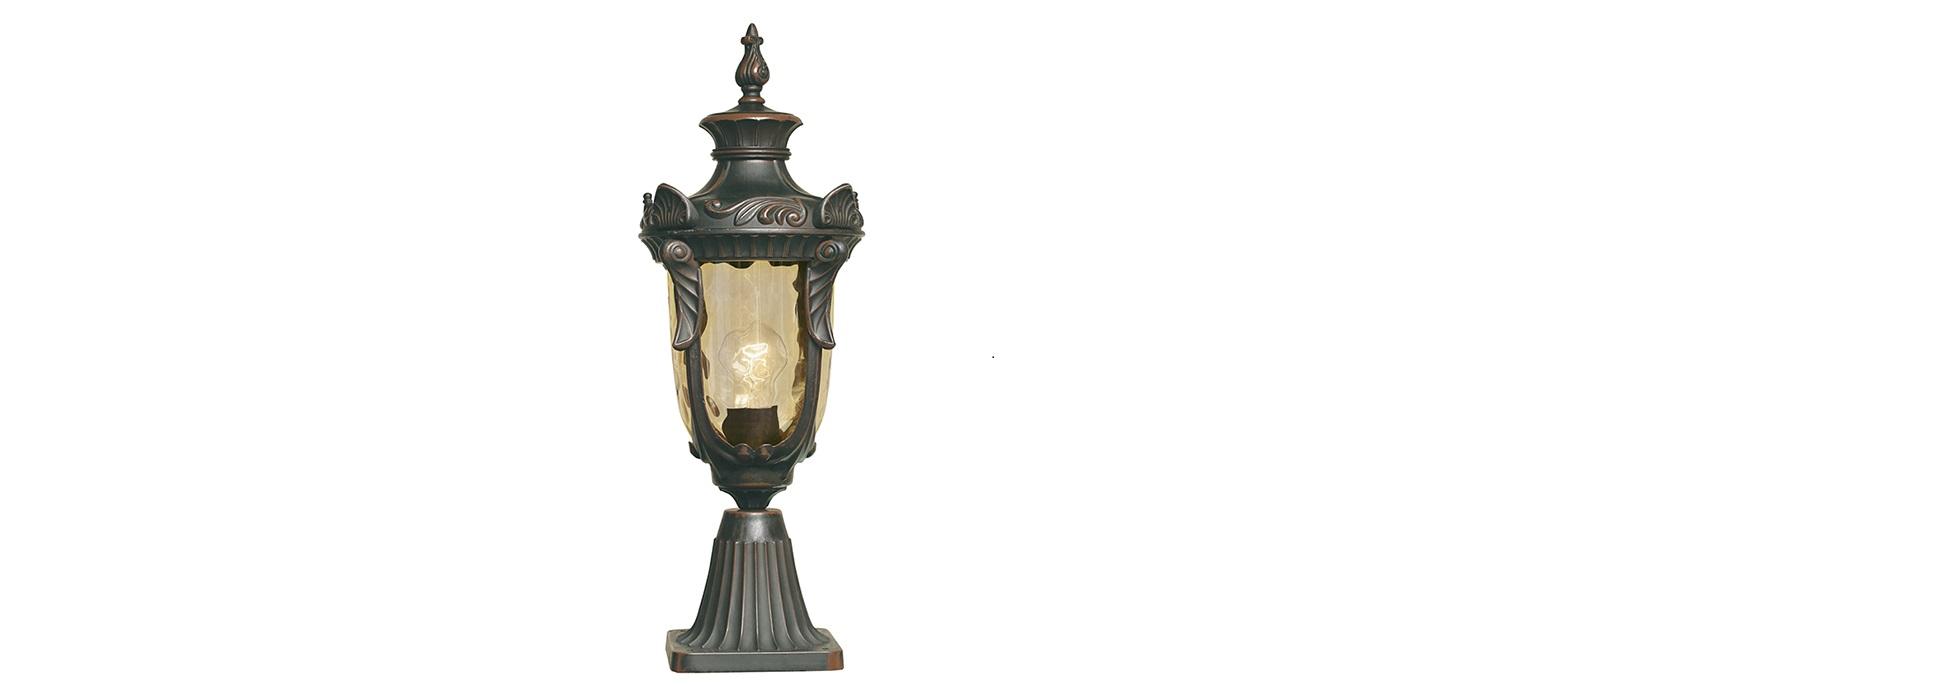 Фонарь-пьедестал Elstead ExteriorУличные наземные светильники<br>Цоколь: E27.&amp;lt;div&amp;gt;Мощность: 100W.&amp;lt;/div&amp;gt;&amp;lt;div&amp;gt;Количество ламп: 1.&amp;amp;nbsp;&amp;lt;/div&amp;gt;&amp;lt;div&amp;gt;Цвет: бронзовая патина.&amp;lt;/div&amp;gt;<br><br>Material: Металл<br>Высота см: 54